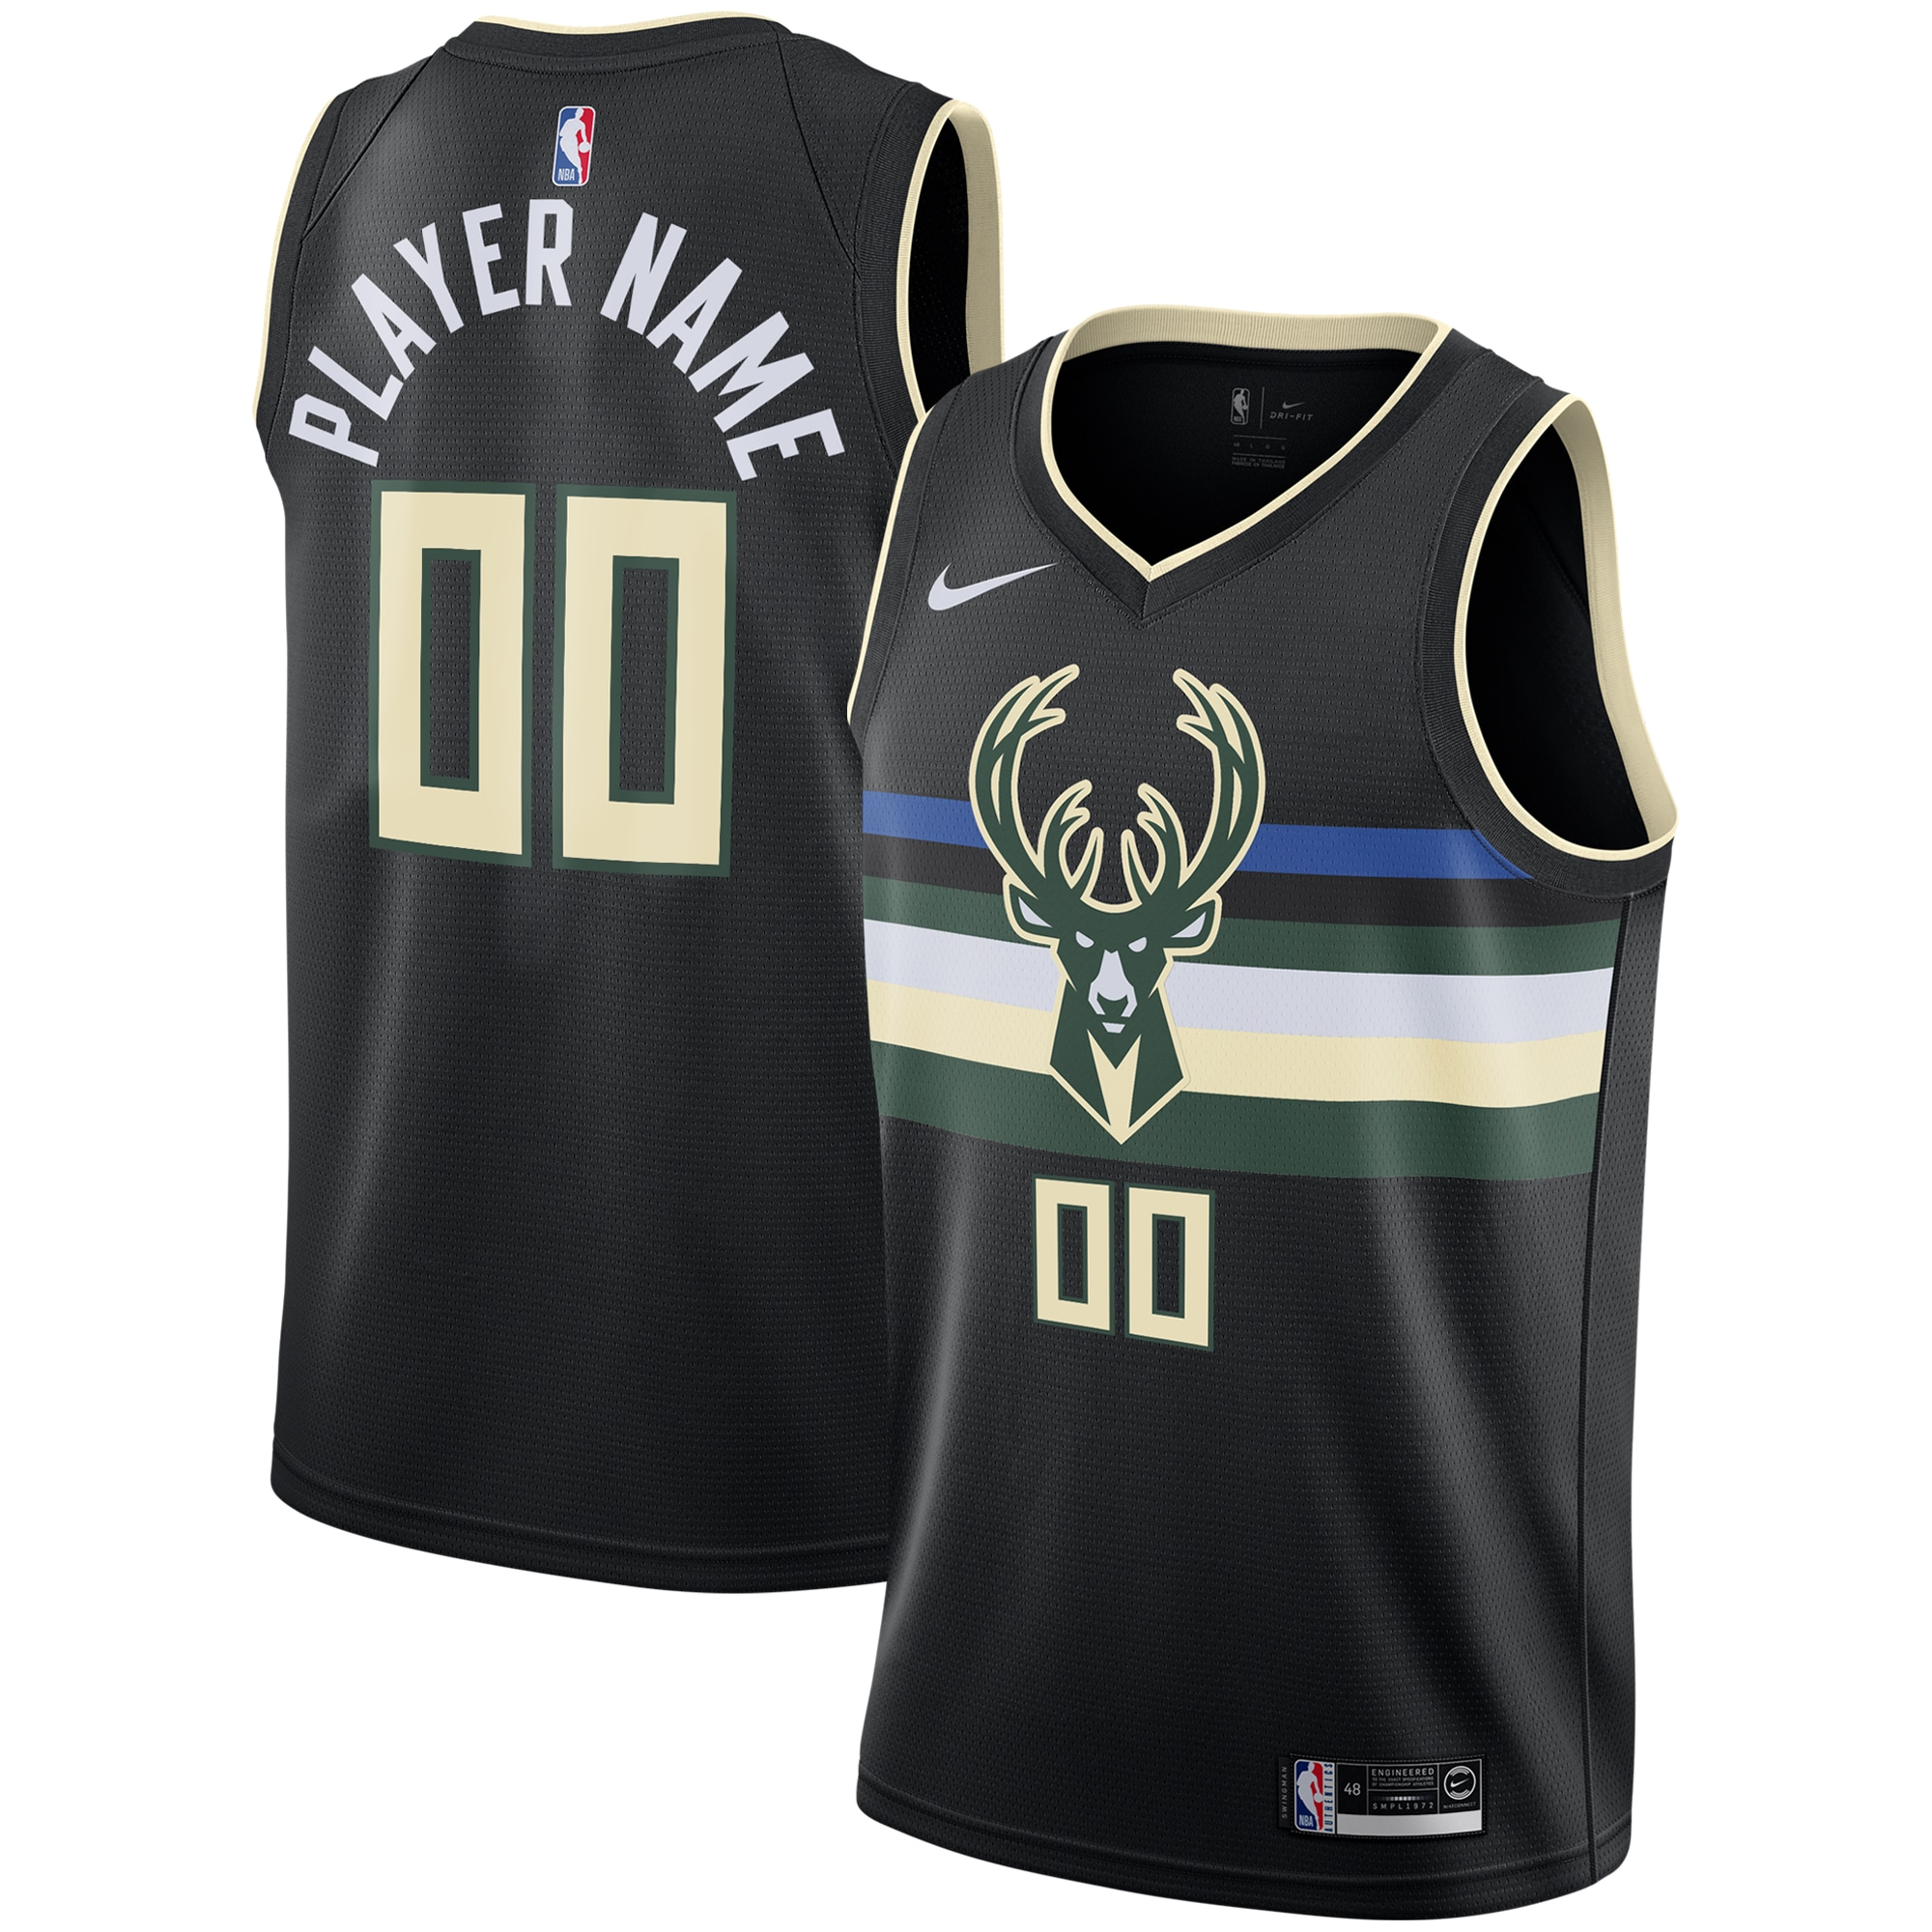 Milwaukee Bucks Nike 2019/20 Custom Swingman Jersey Black - Statement Edition